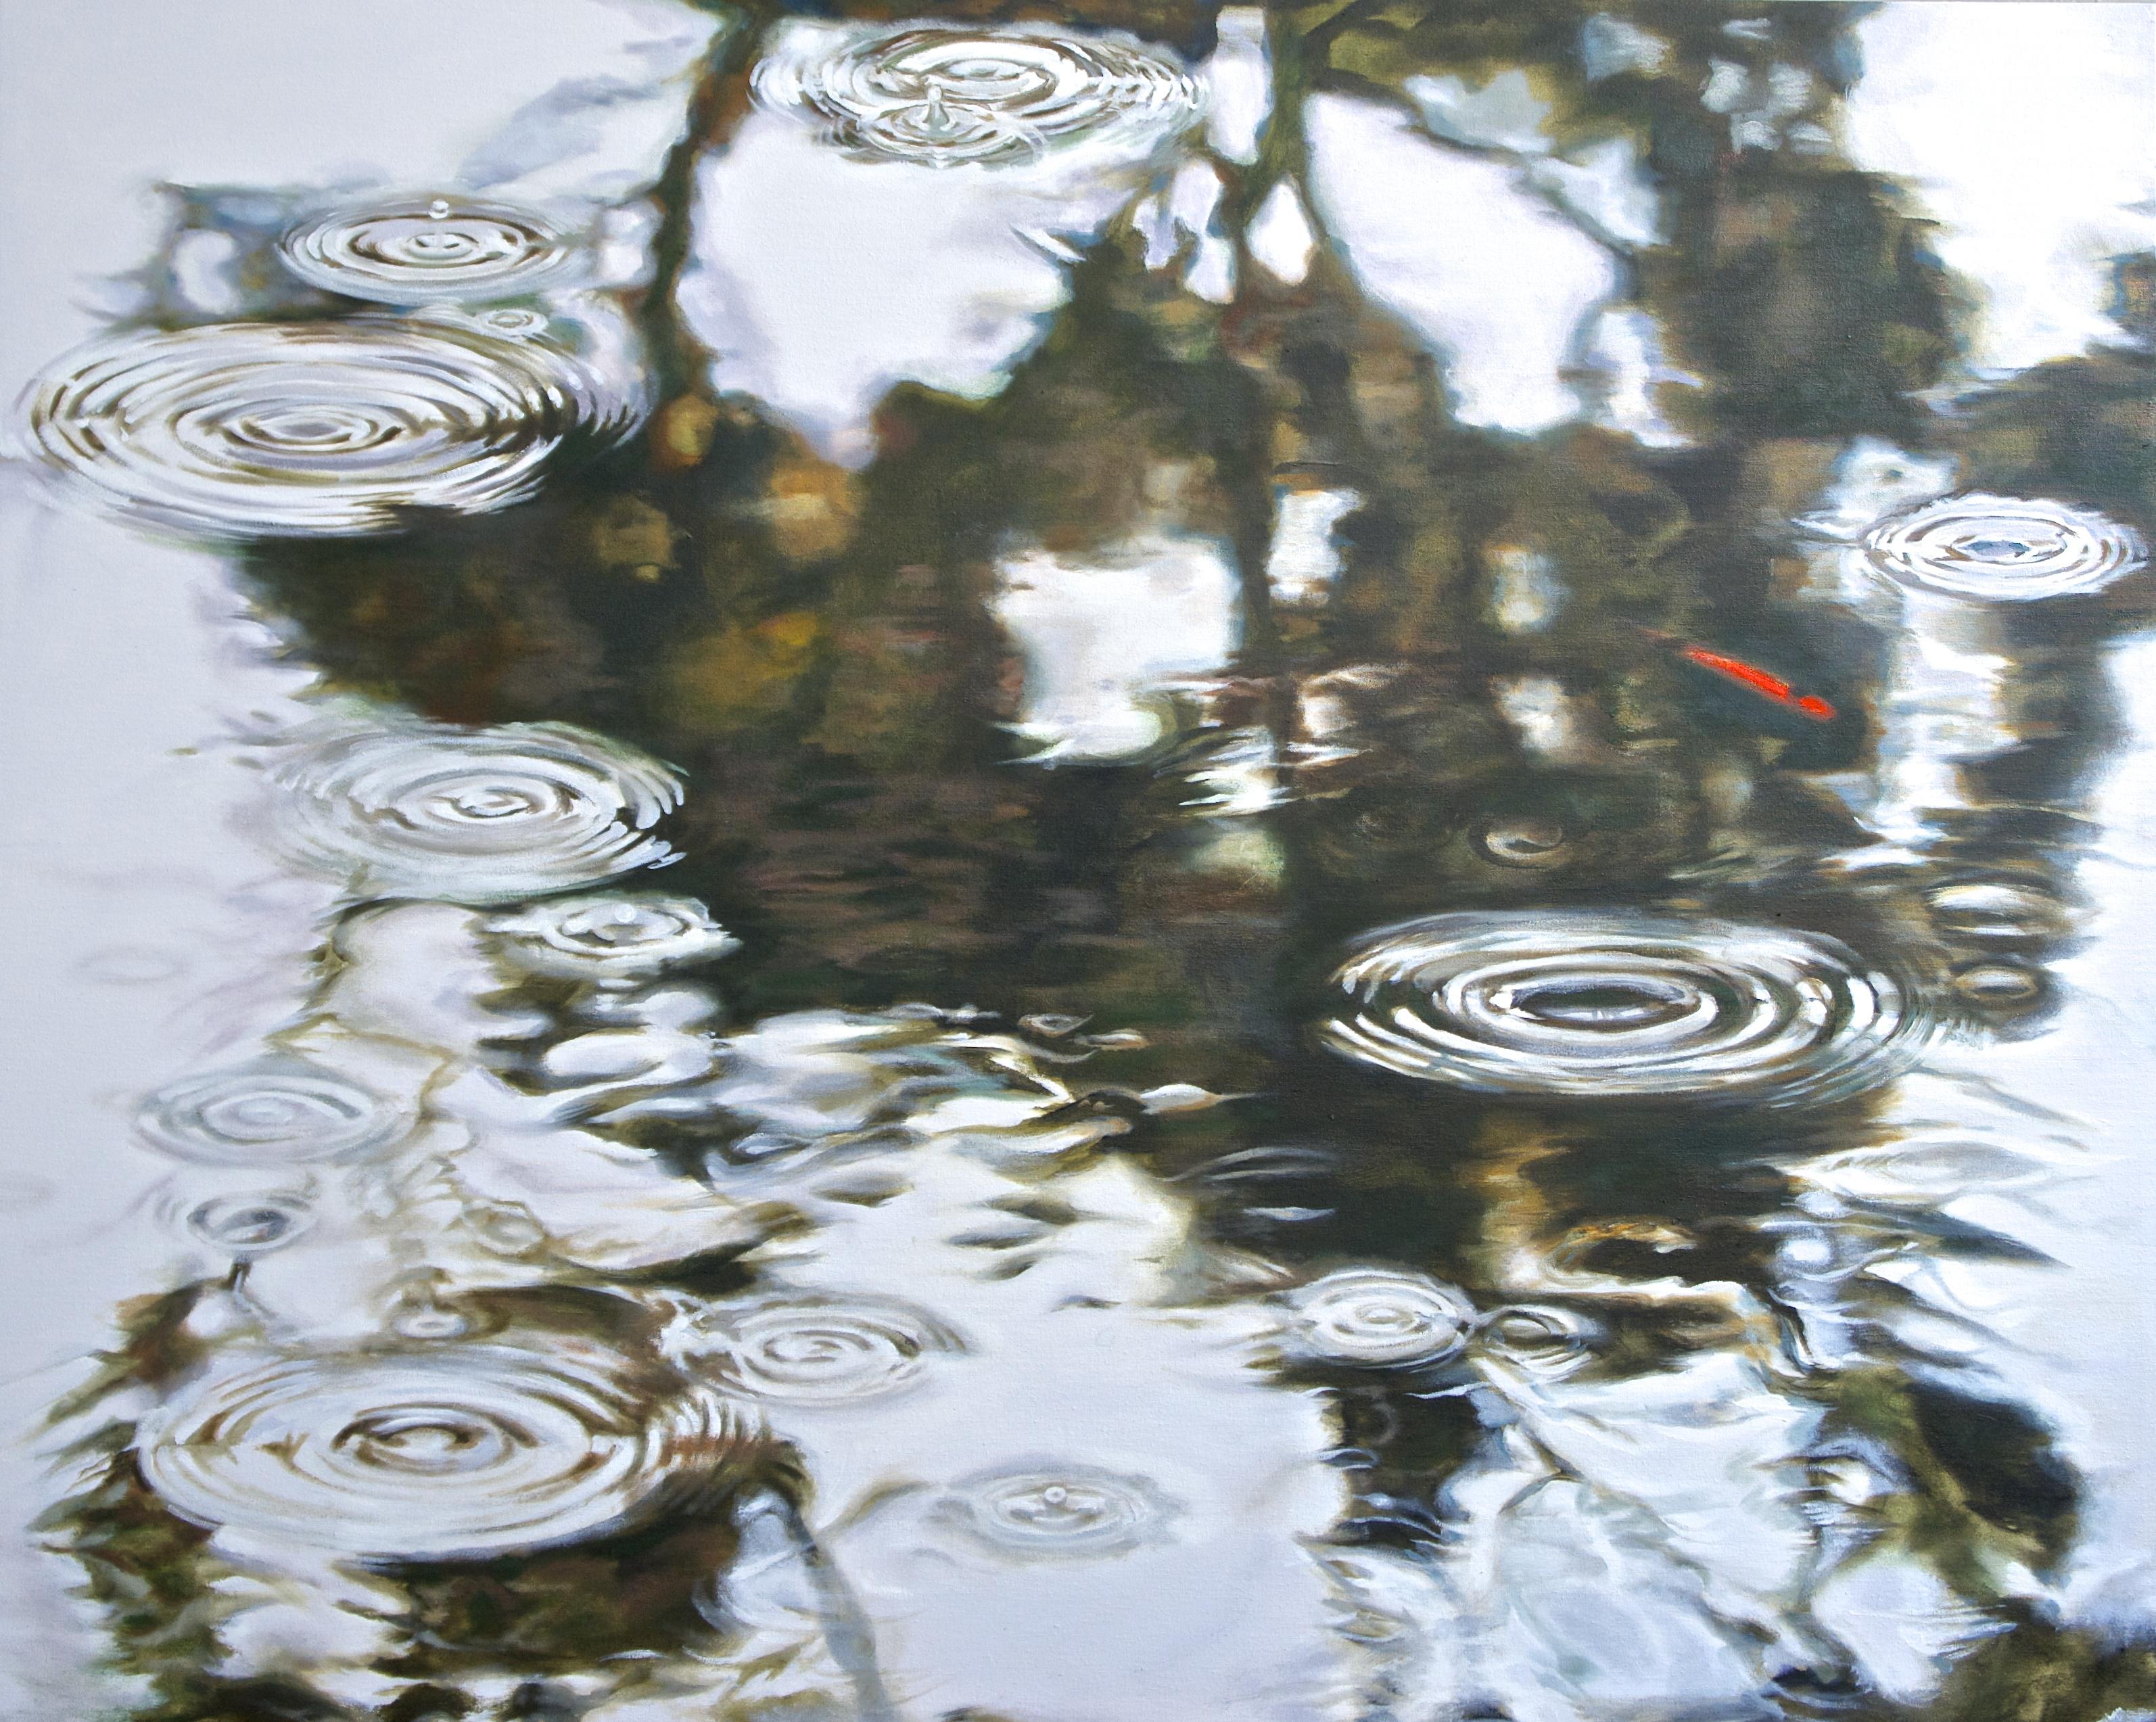 Rain on Water: Eucalyptus tree reflected on rainy pond